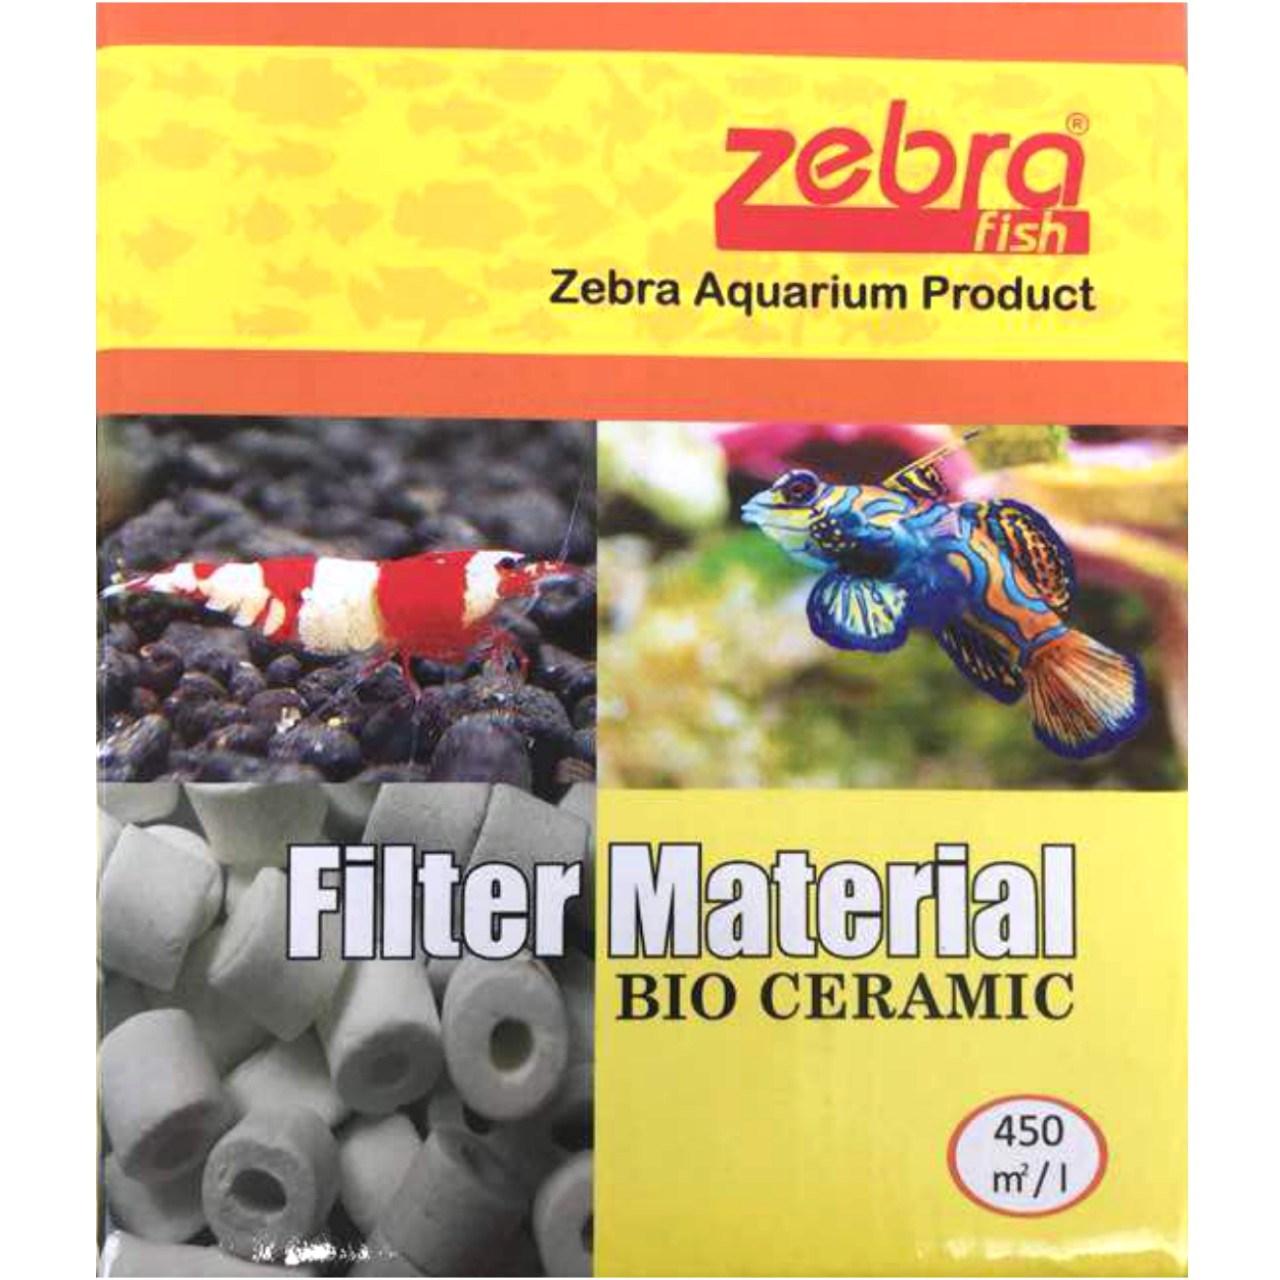 سرامیک آکواریوم  زبرا فیش مدل Filter Material Bio Ceramic وزن 450 میلی لیتر